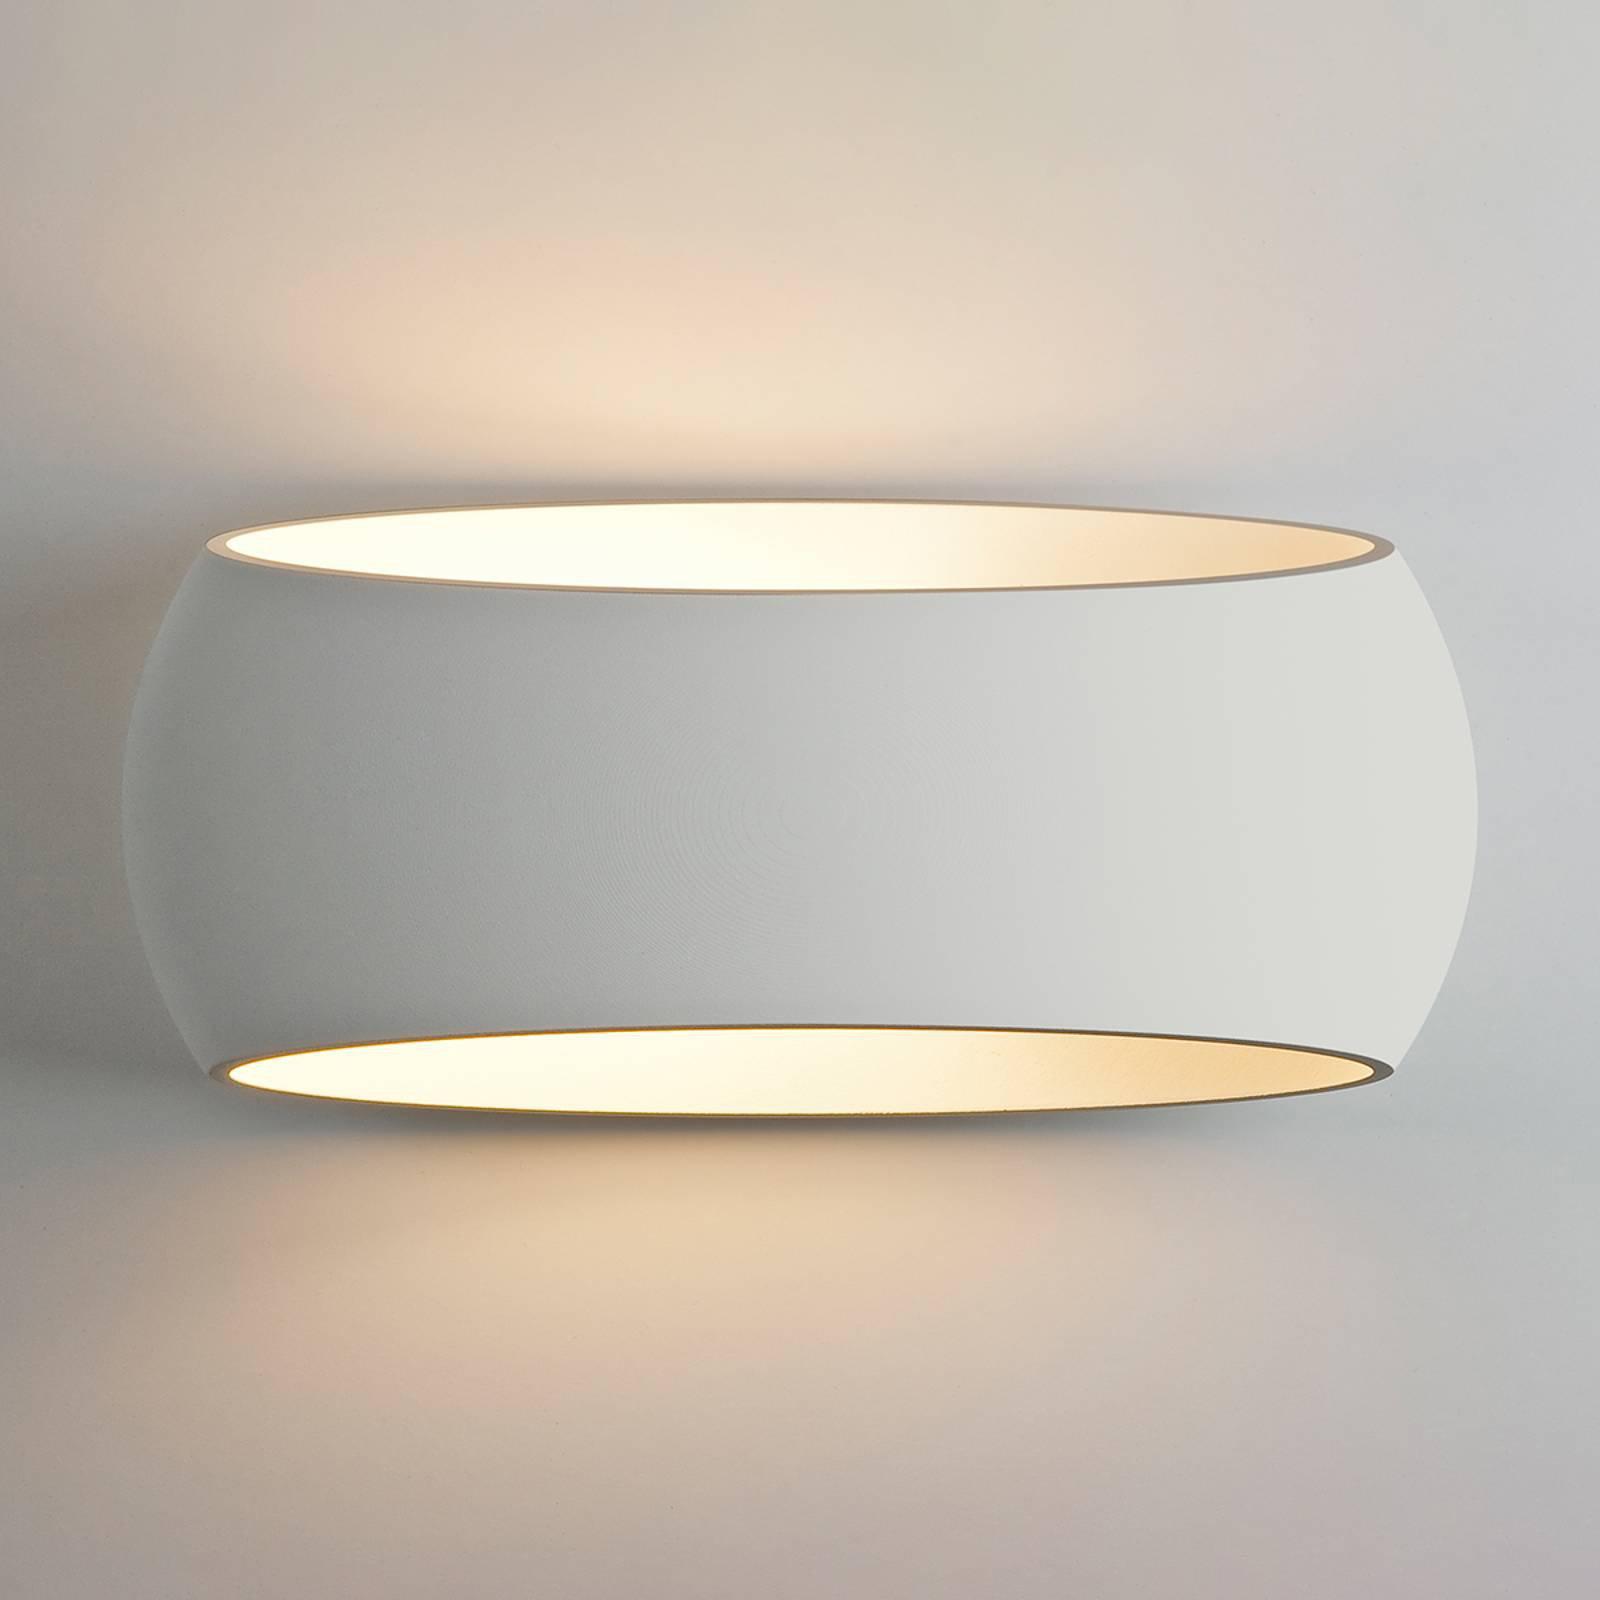 Vegglampe Aria i gips, kan utformes individuelt